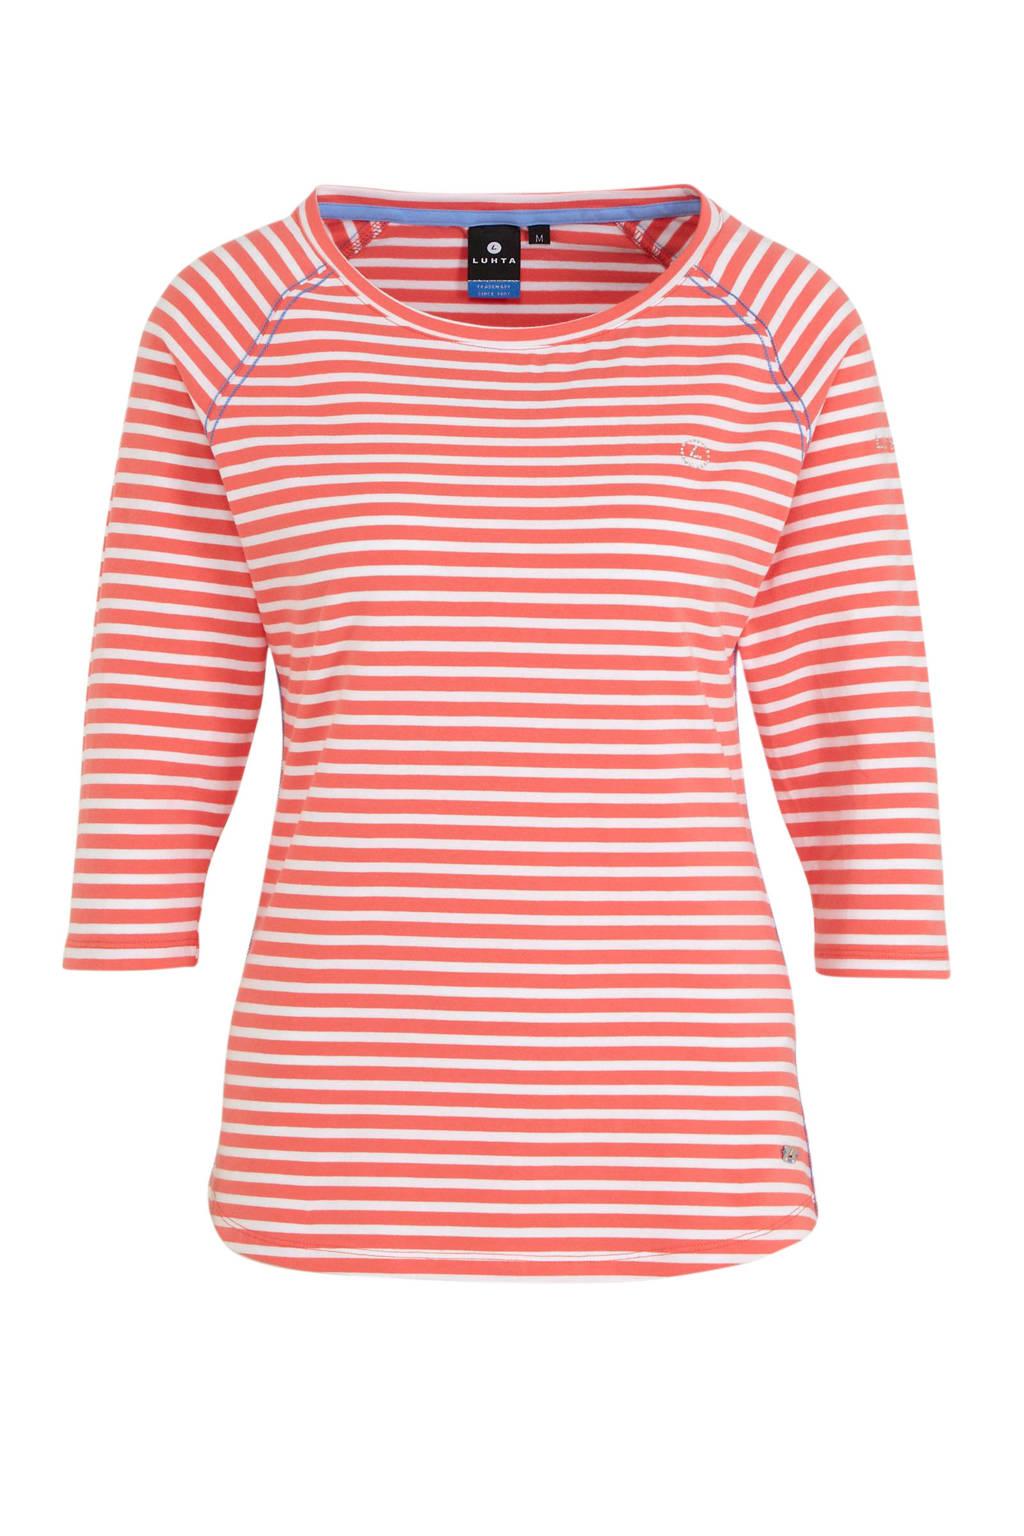 Luhta Arima outdoor T-shirt roze, Roze/wit